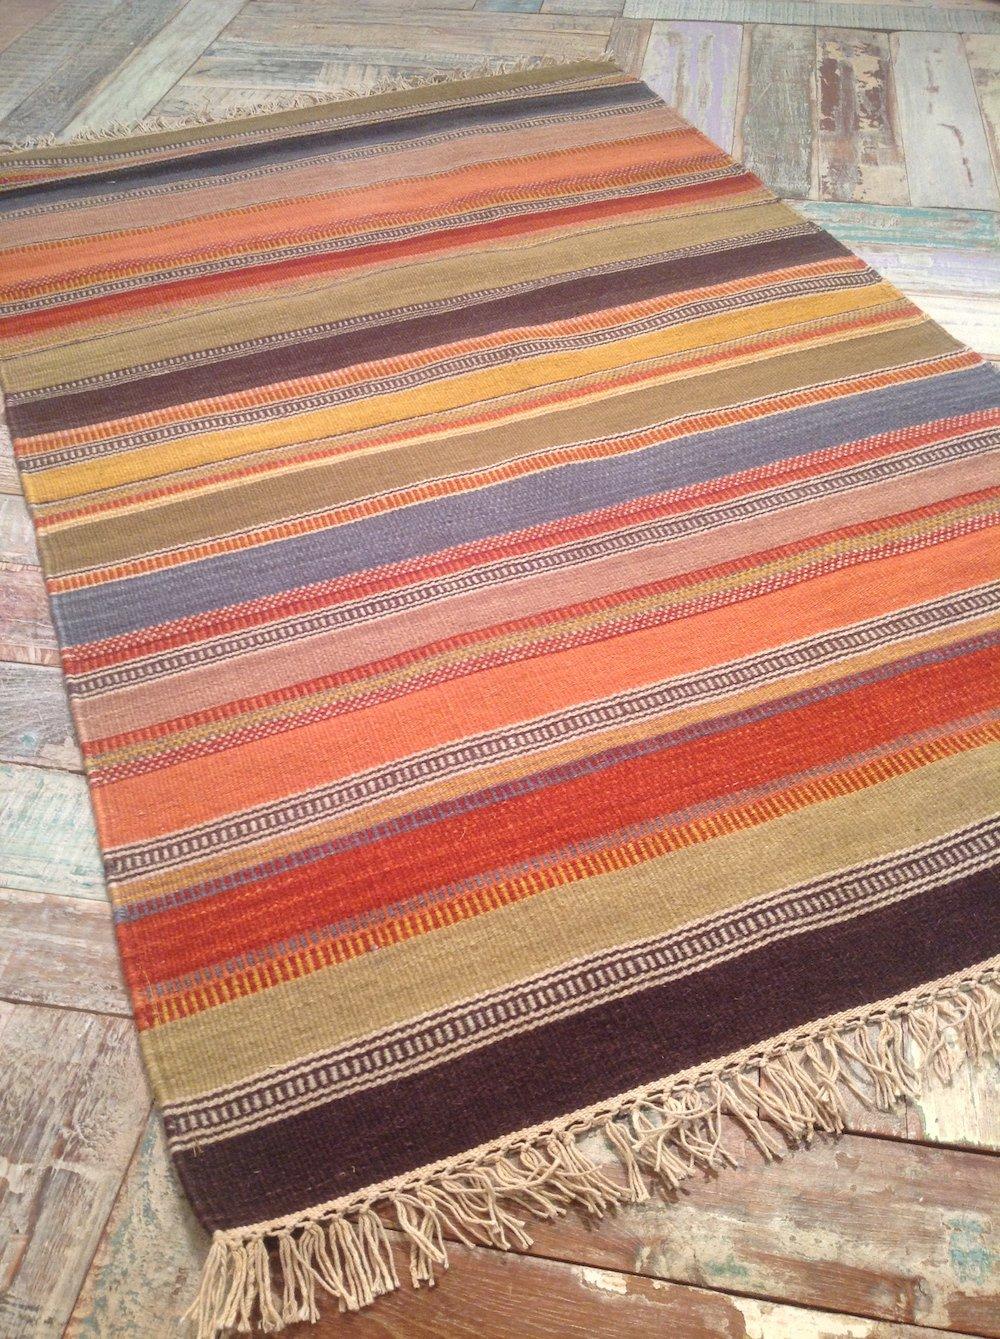 Second Nature Fair Trade Kelim Teppich – Ooty Kissenbezug, 75 cm x 120 cm in feines Gewebe Wolle